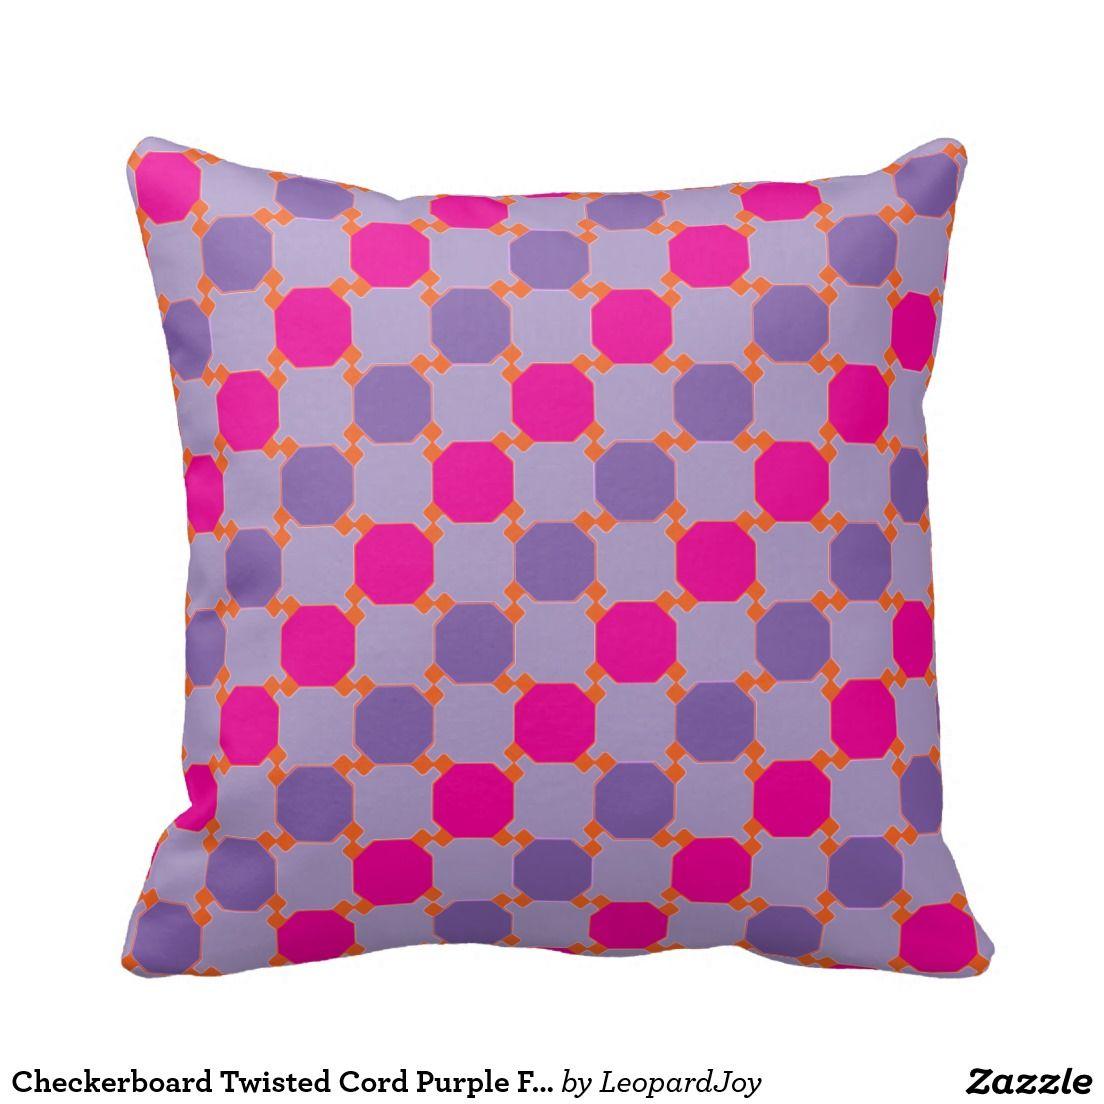 Checkerboard twisted cord purple fuchsia pillow cord and pillows